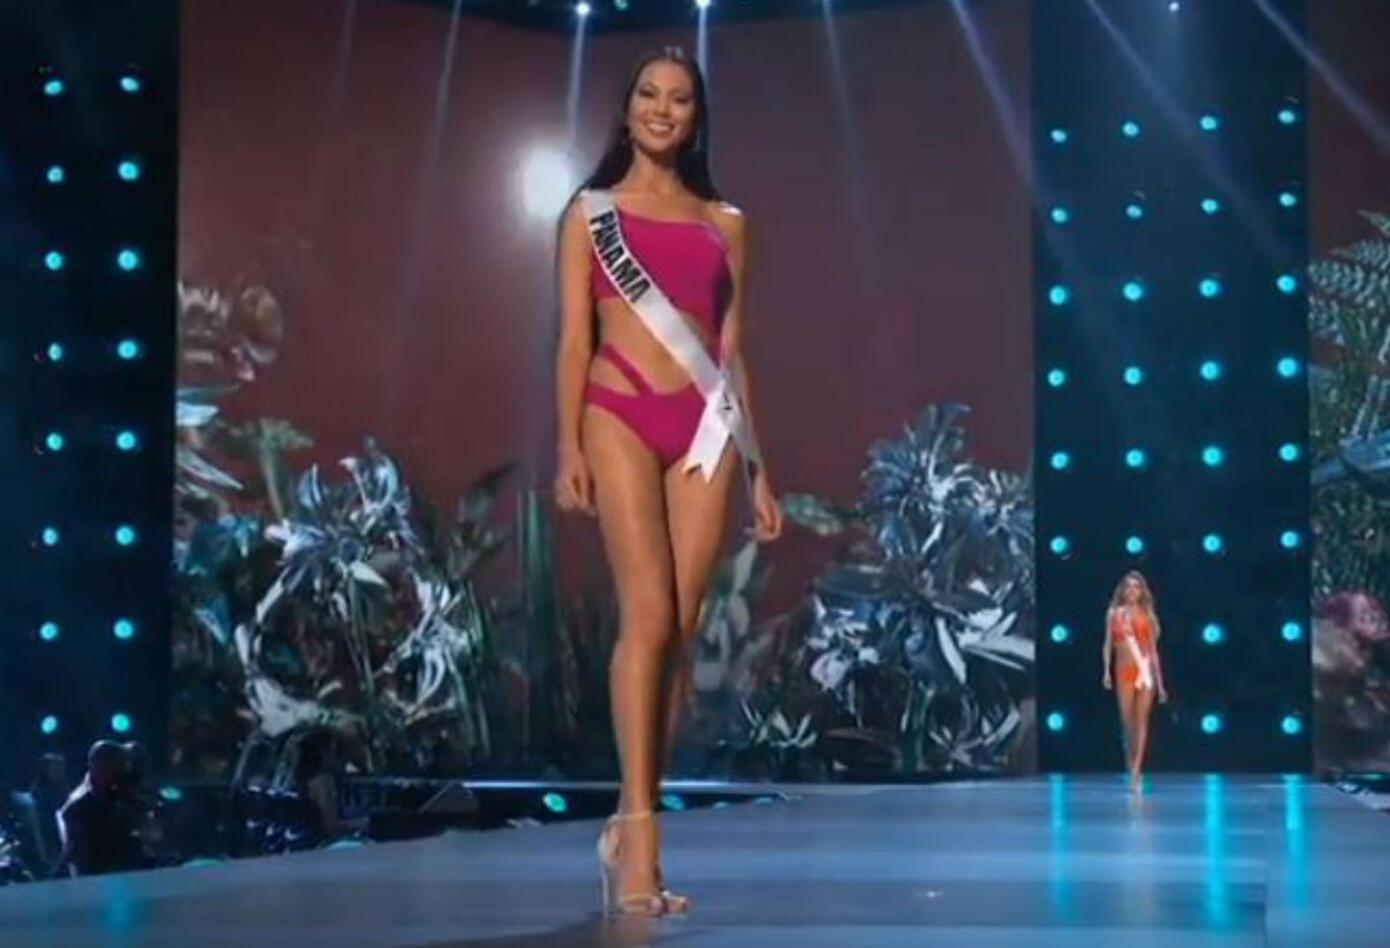 Desfile en traje de baño de Rosa Iveth Montezuma, Miss Panamá